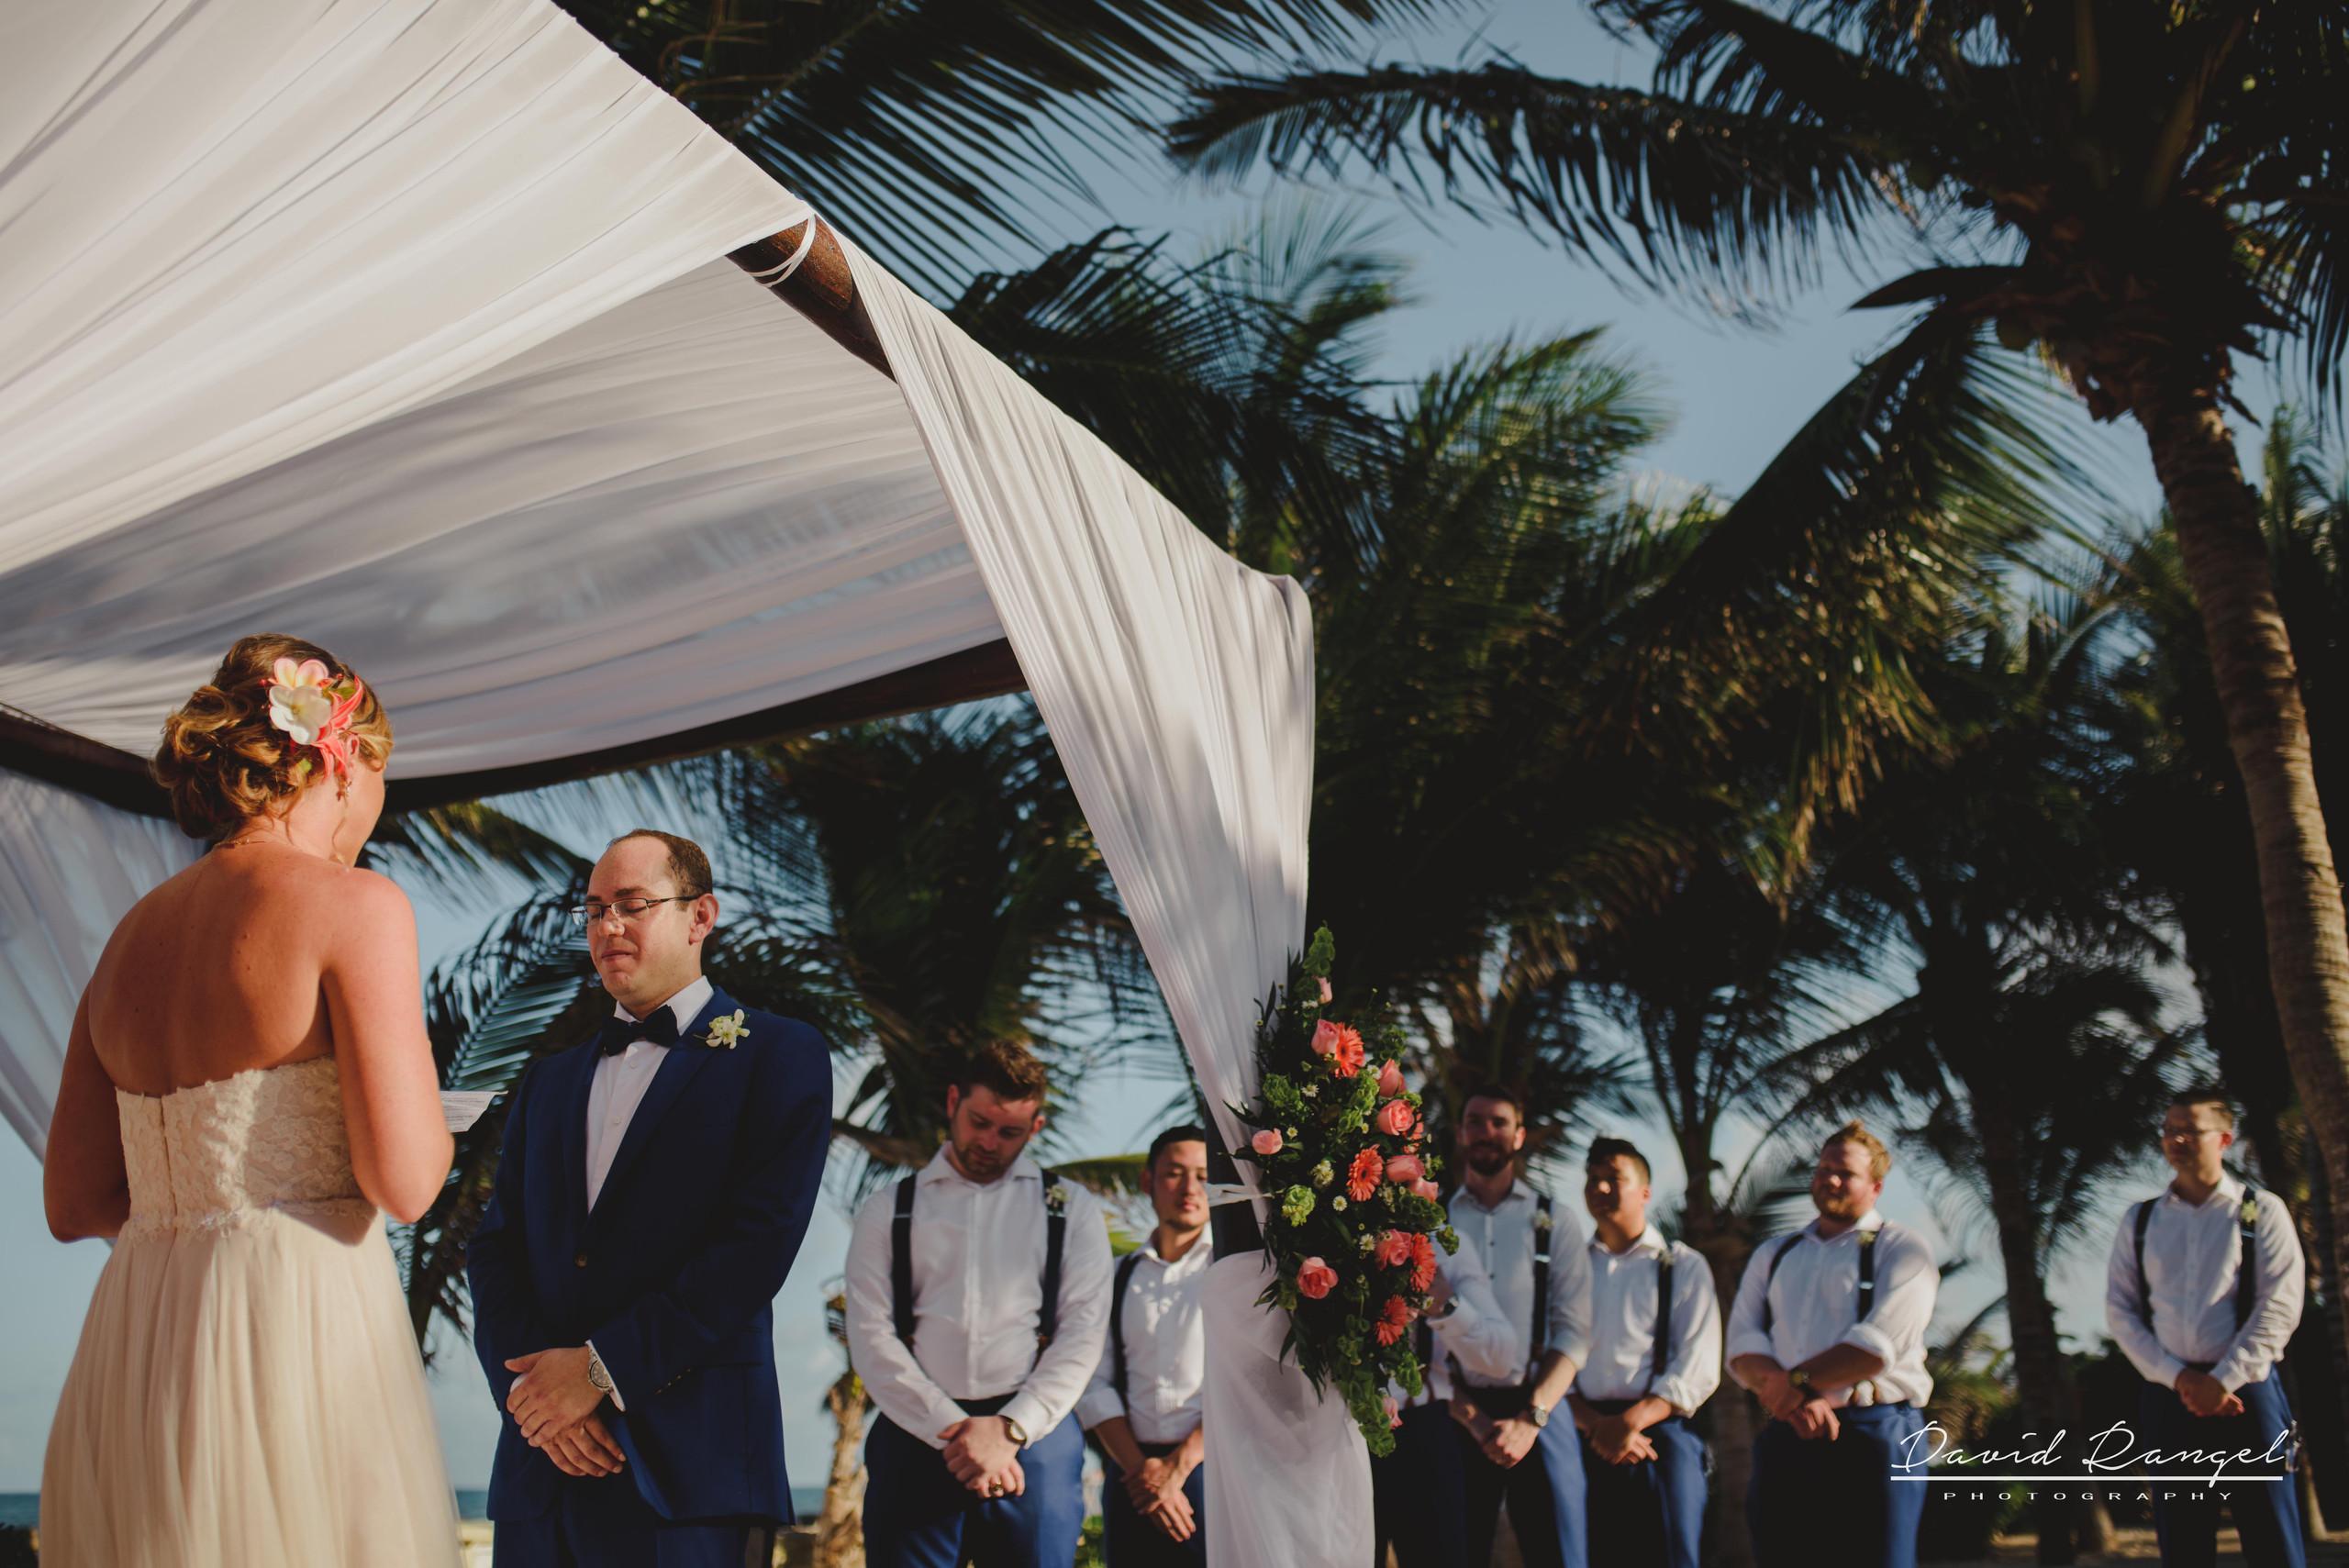 wedding+gazebo+beach+ceremony+photo+groom+bride